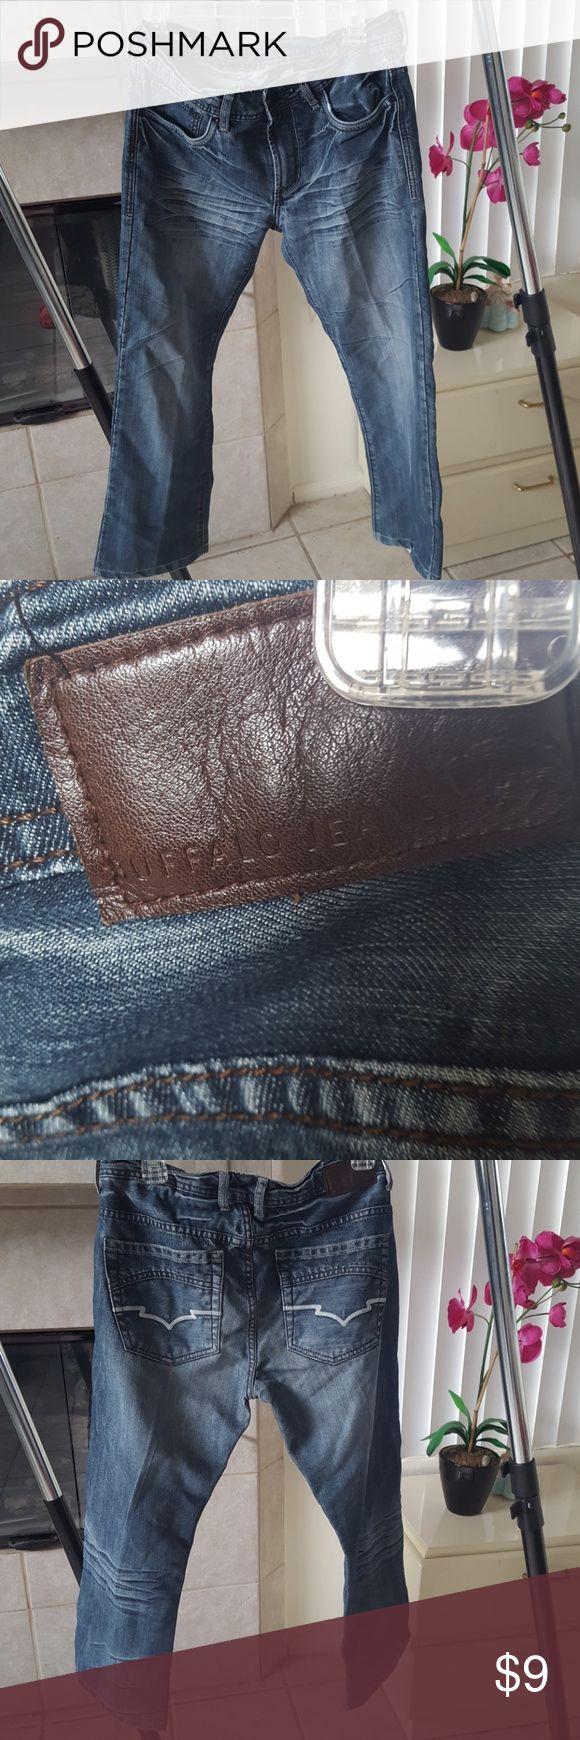 Buffalo jeans sz 30 Buffalo jeans Buffalo Jeans Boyfriend